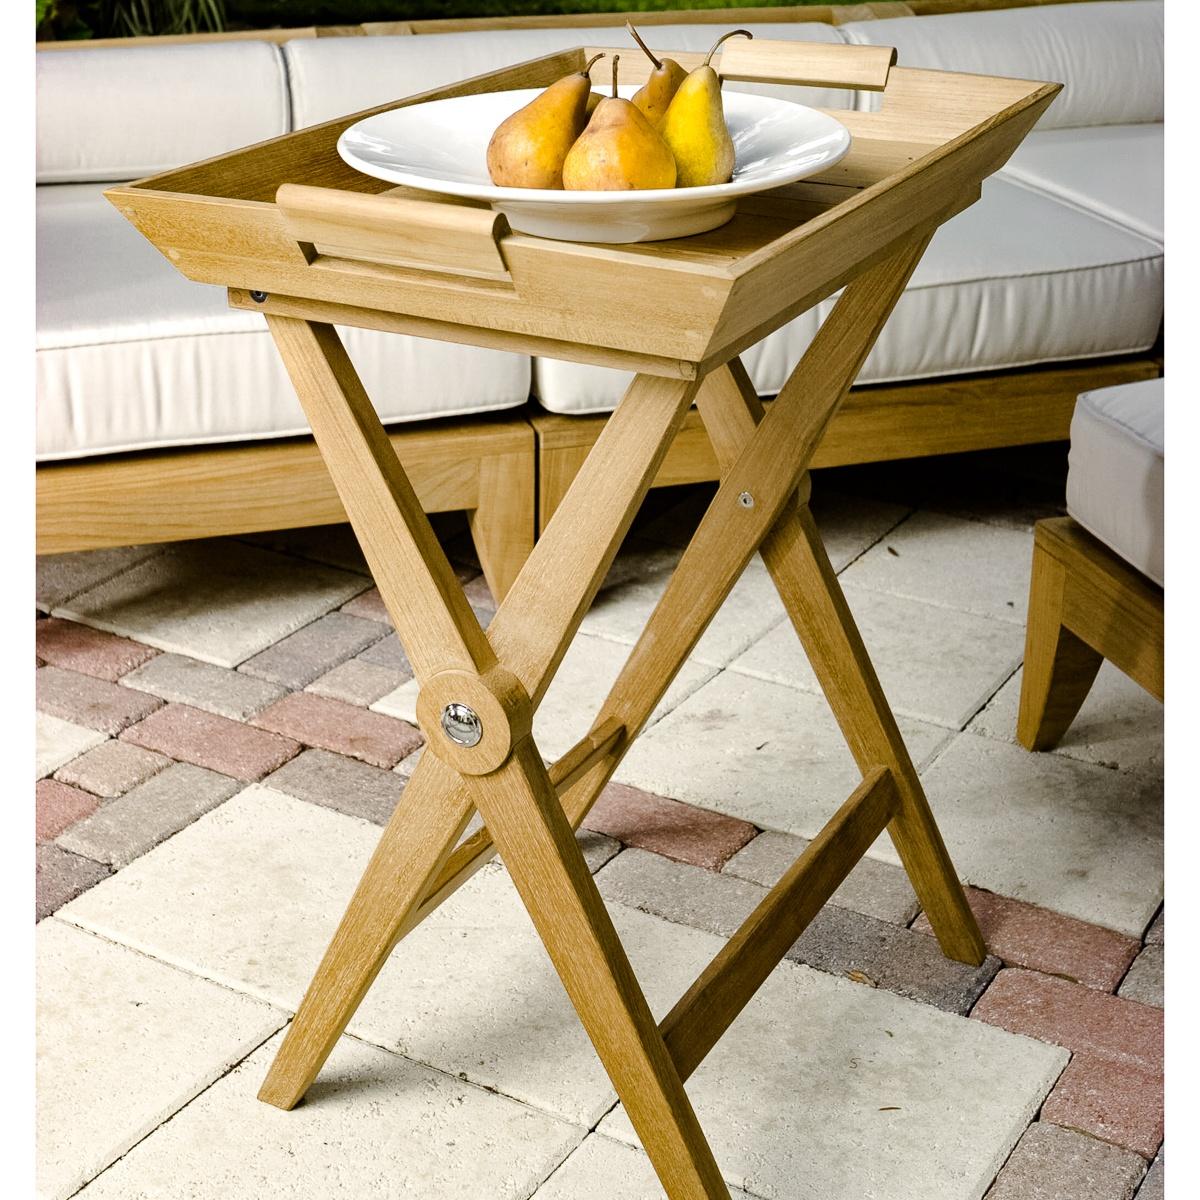 Folding Teak Wood Tray Table Westminster Teak Outdoor Furniture